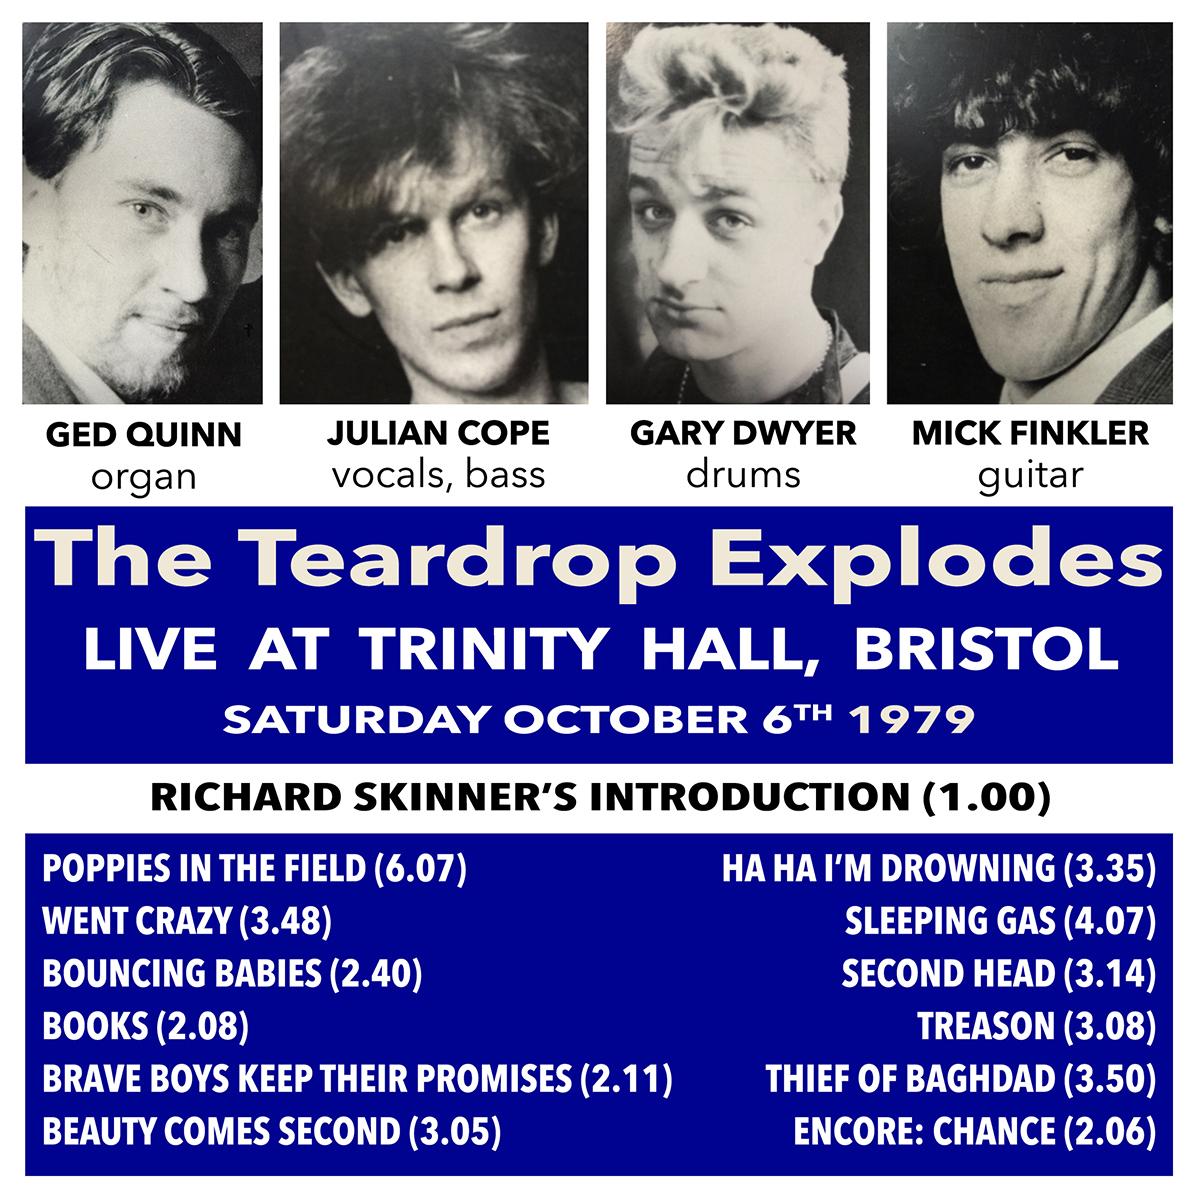 Le Live de la semaine – The Teardrop Explodes – Trinity Hall – Bristol